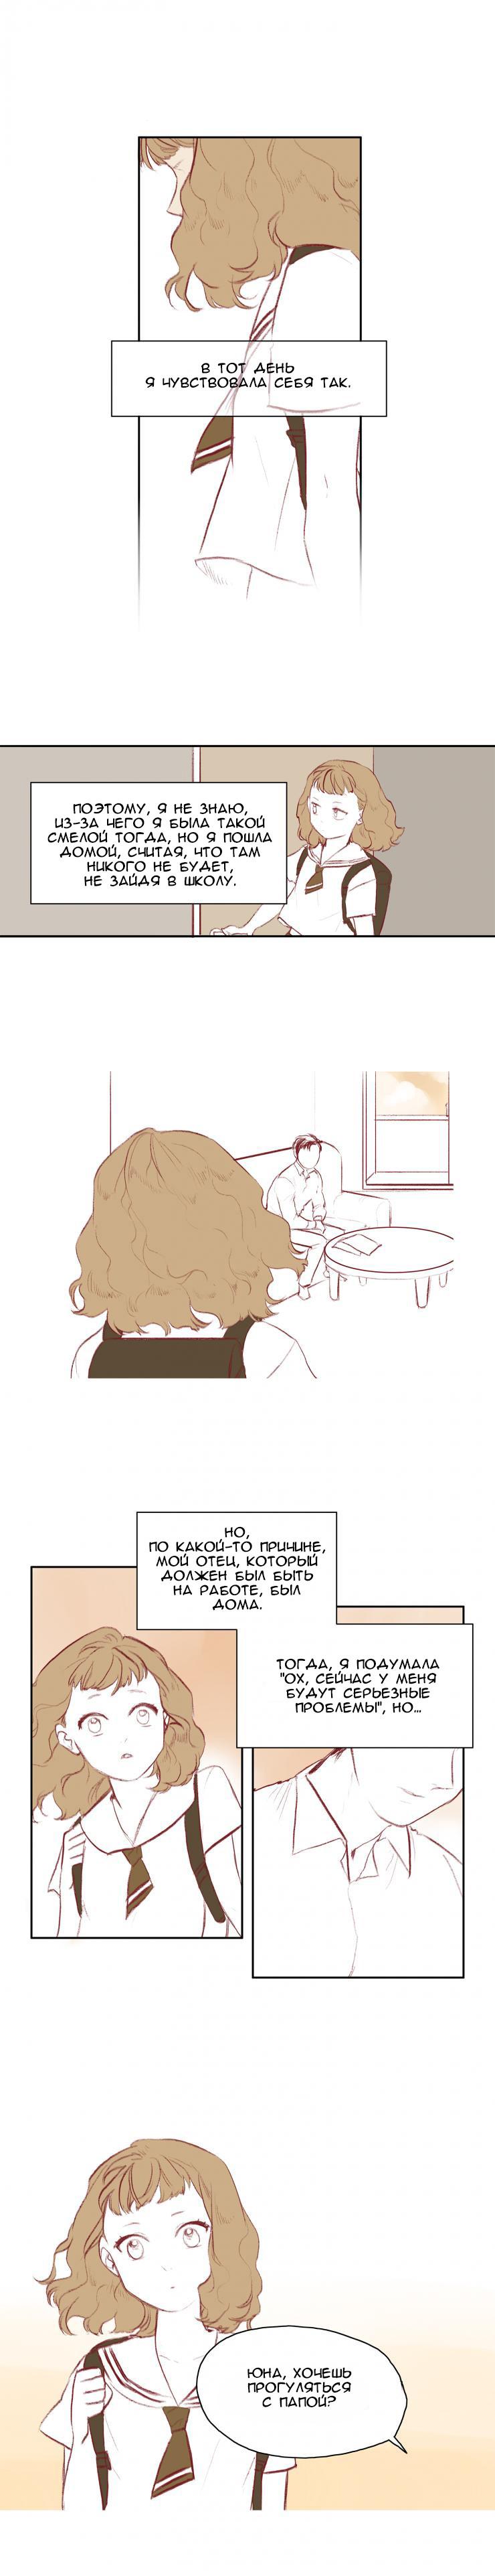 https://r1.ninemanga.com/comics/pic2/30/31902/435034/153680742048.jpg Page 5